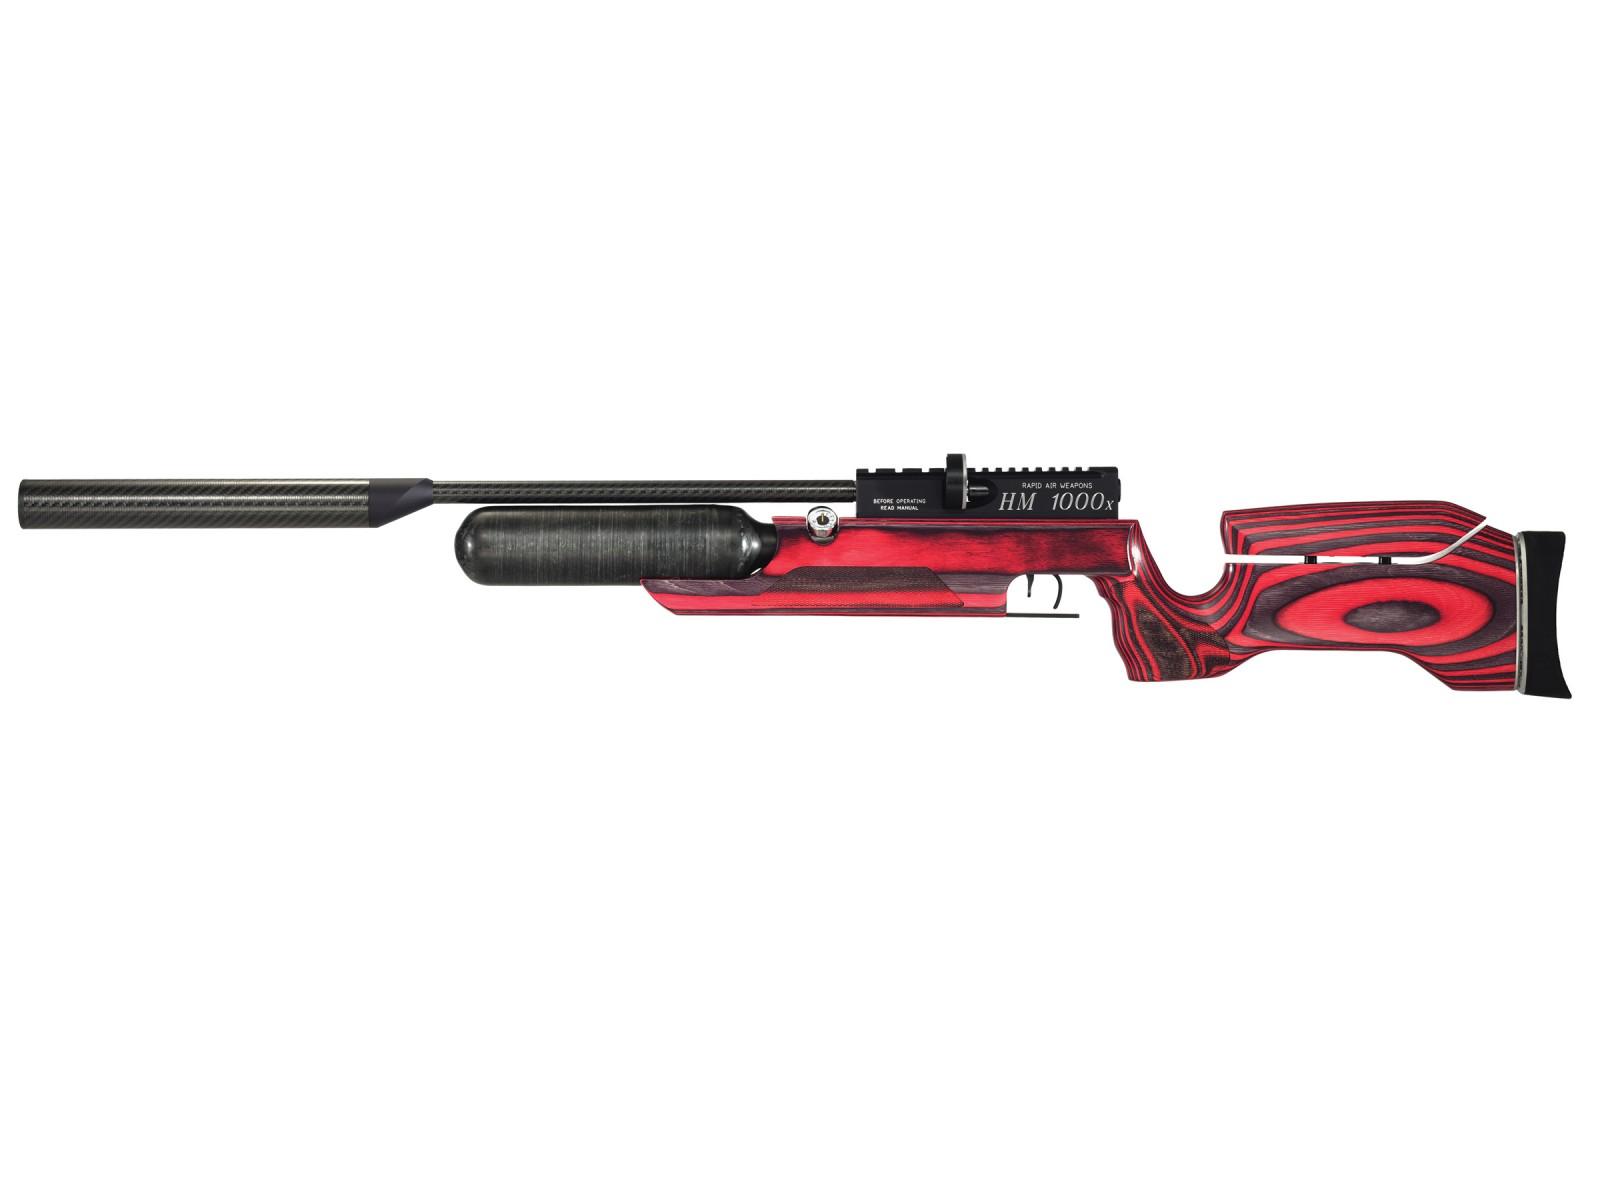 RAW HM1000x LRT PCP Air Rifle, Red Laminate Stock 0.22 Image